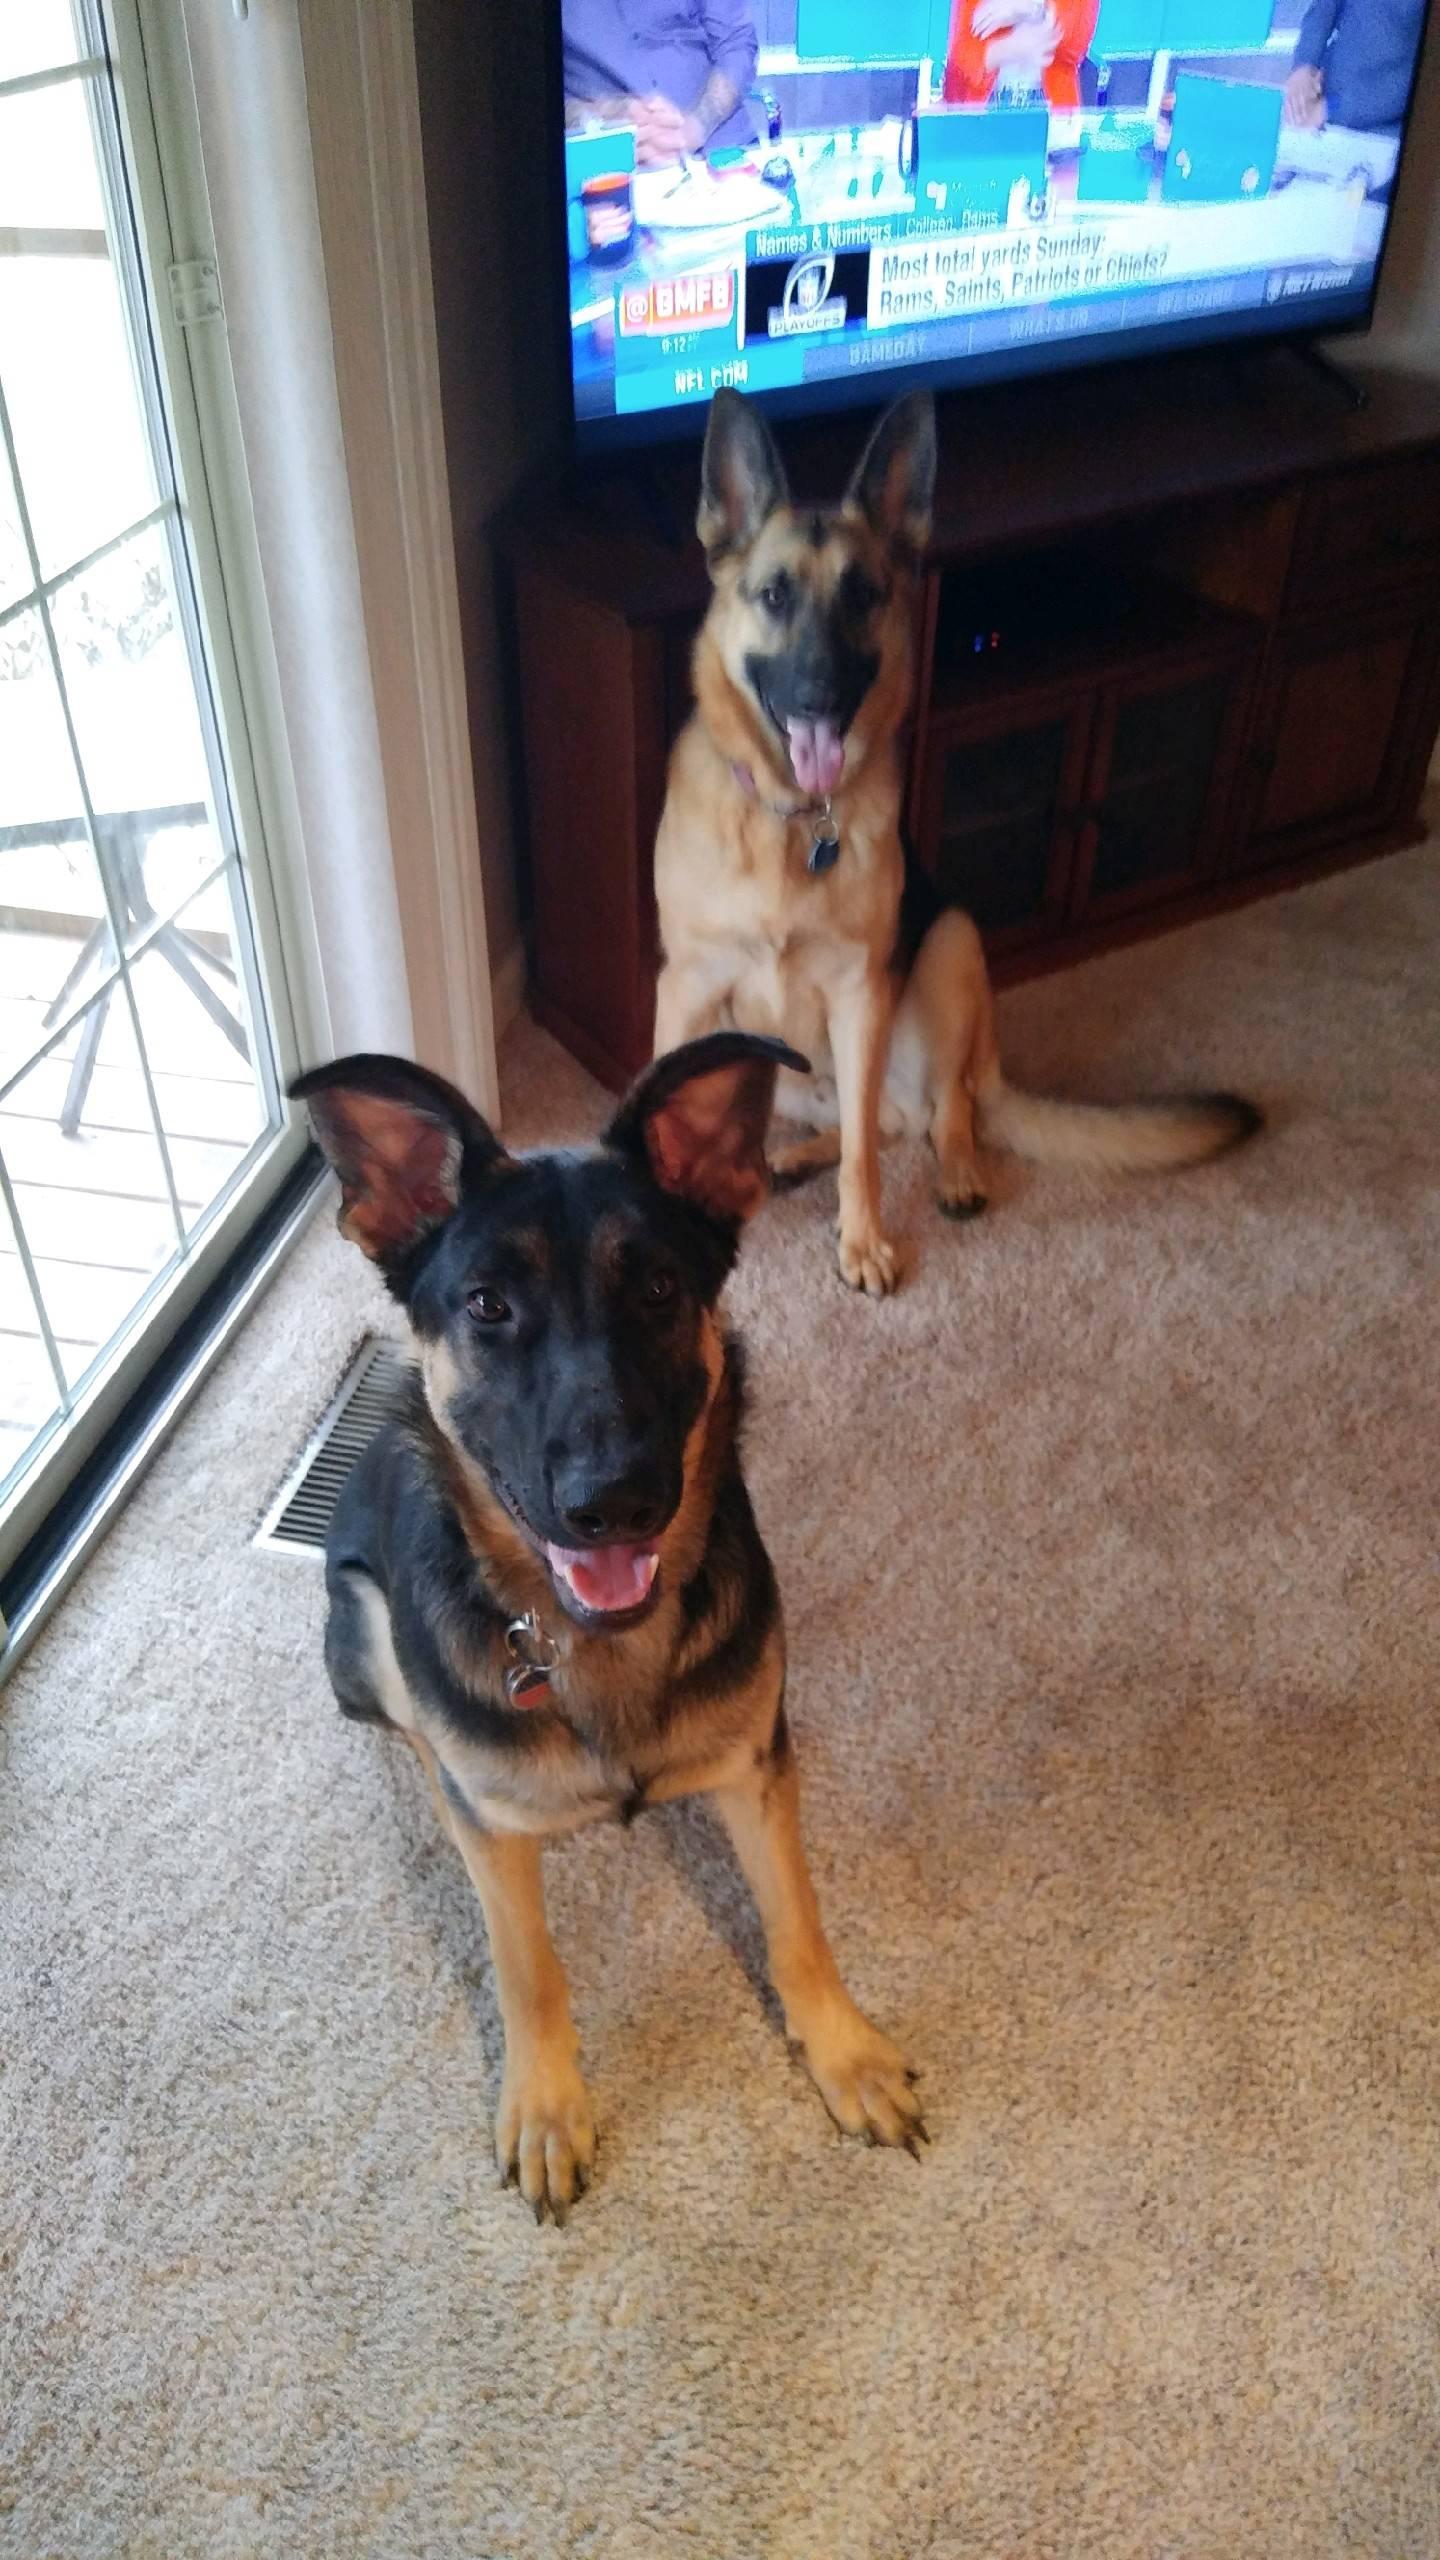 Major and Lenny